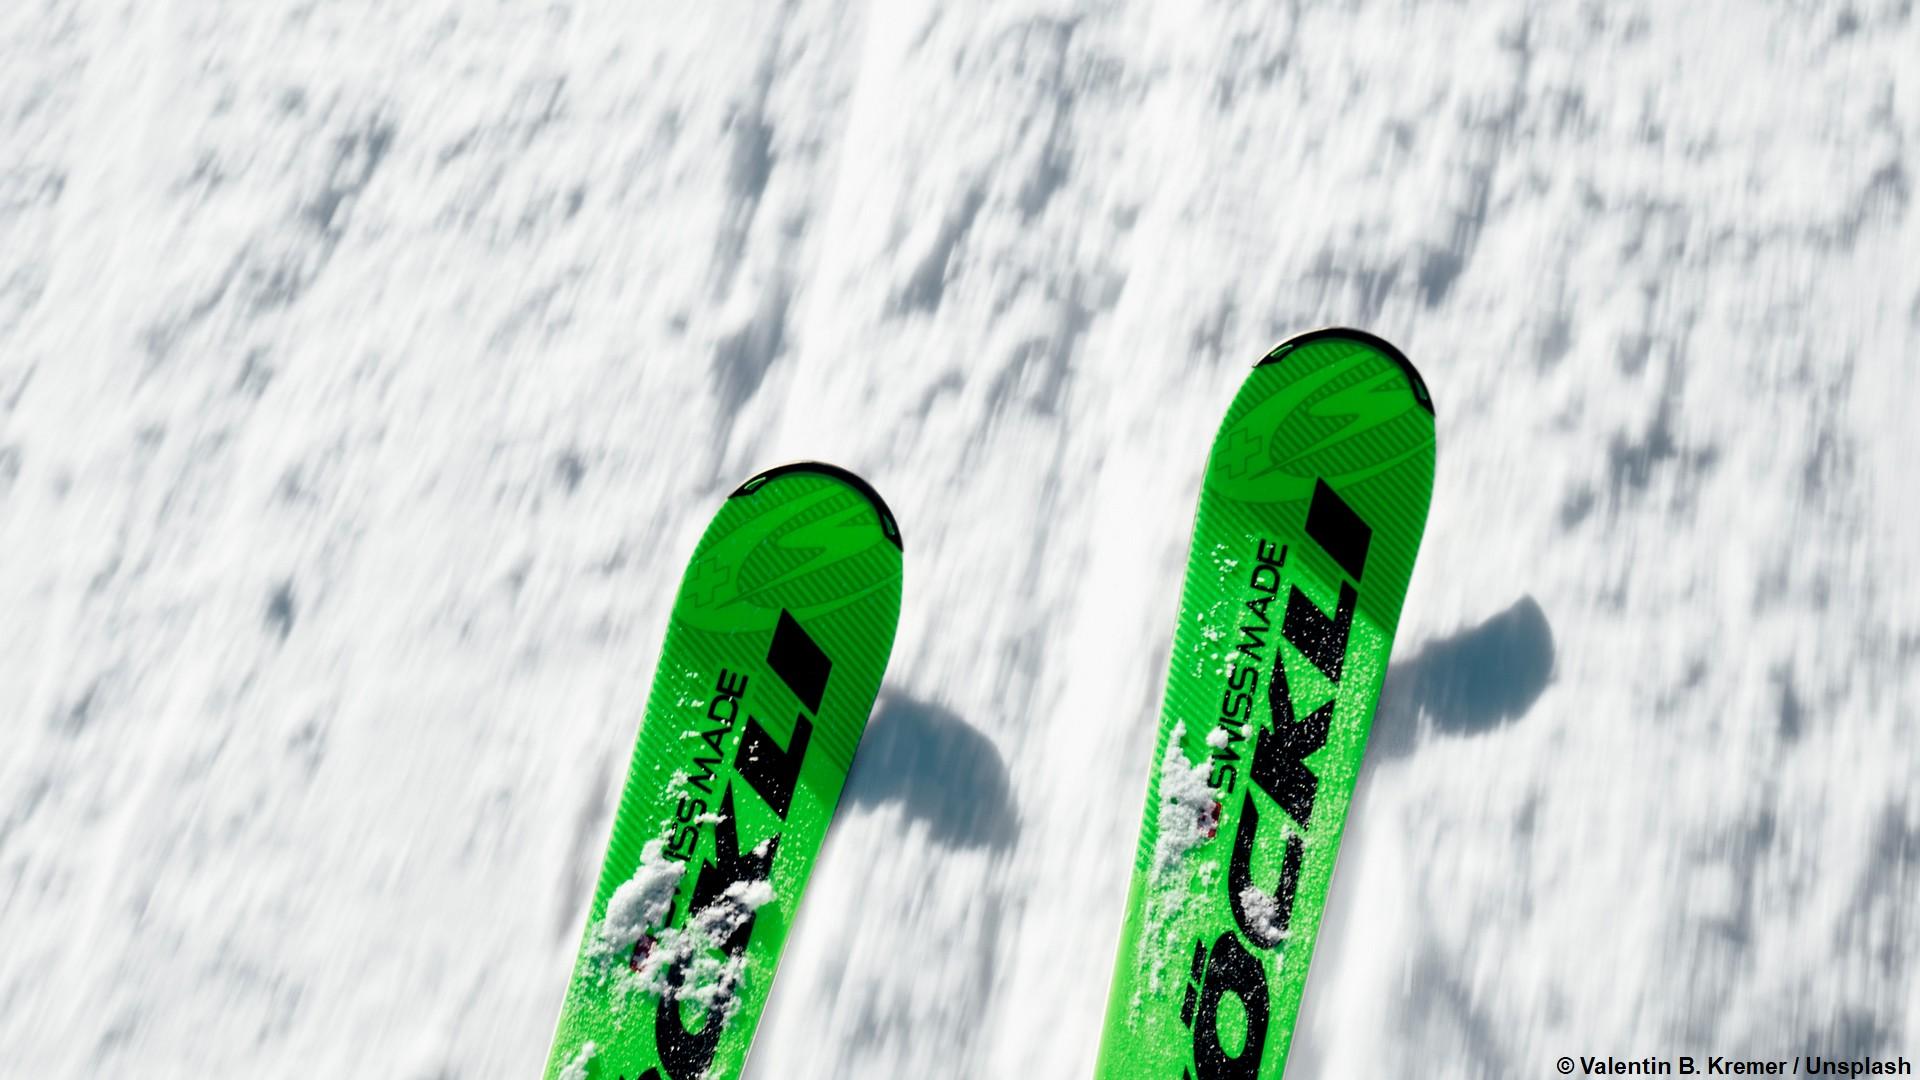 Ski (générique) (c) Valentin B. Kremer Unsplash